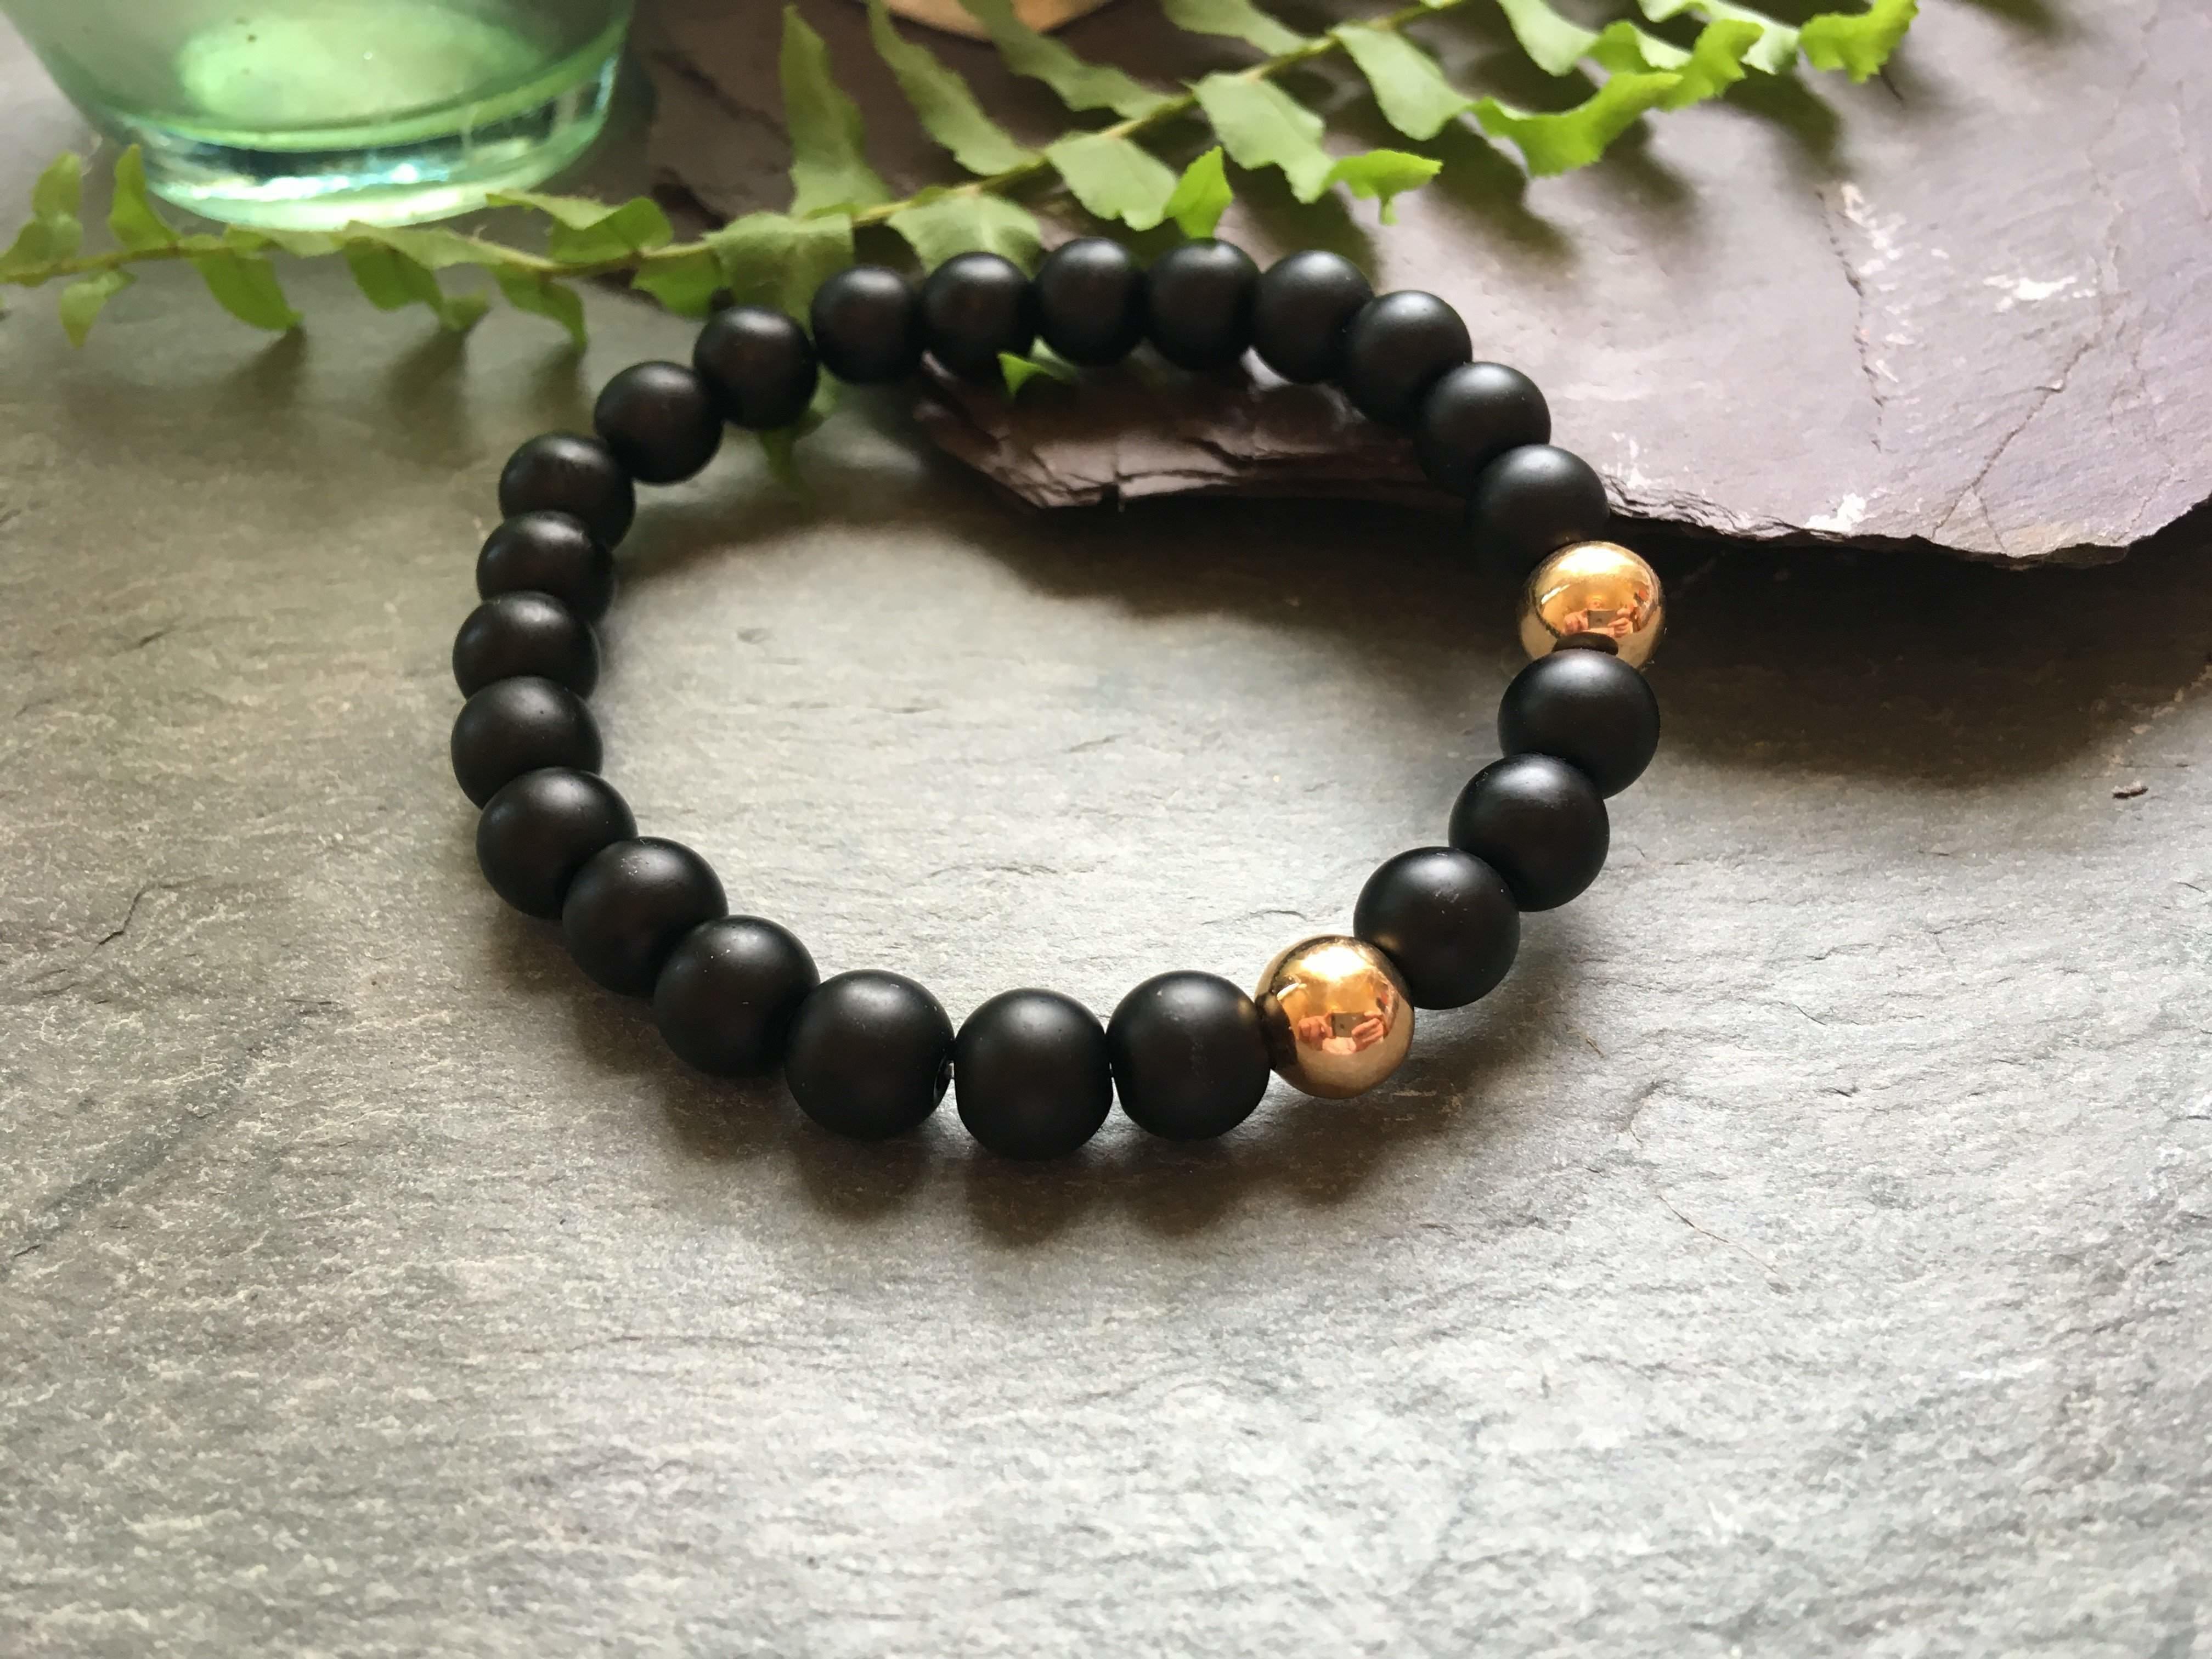 Black And Gold Stylish Bead Bracelet 2 Rose Coloured Metal Beads Liv